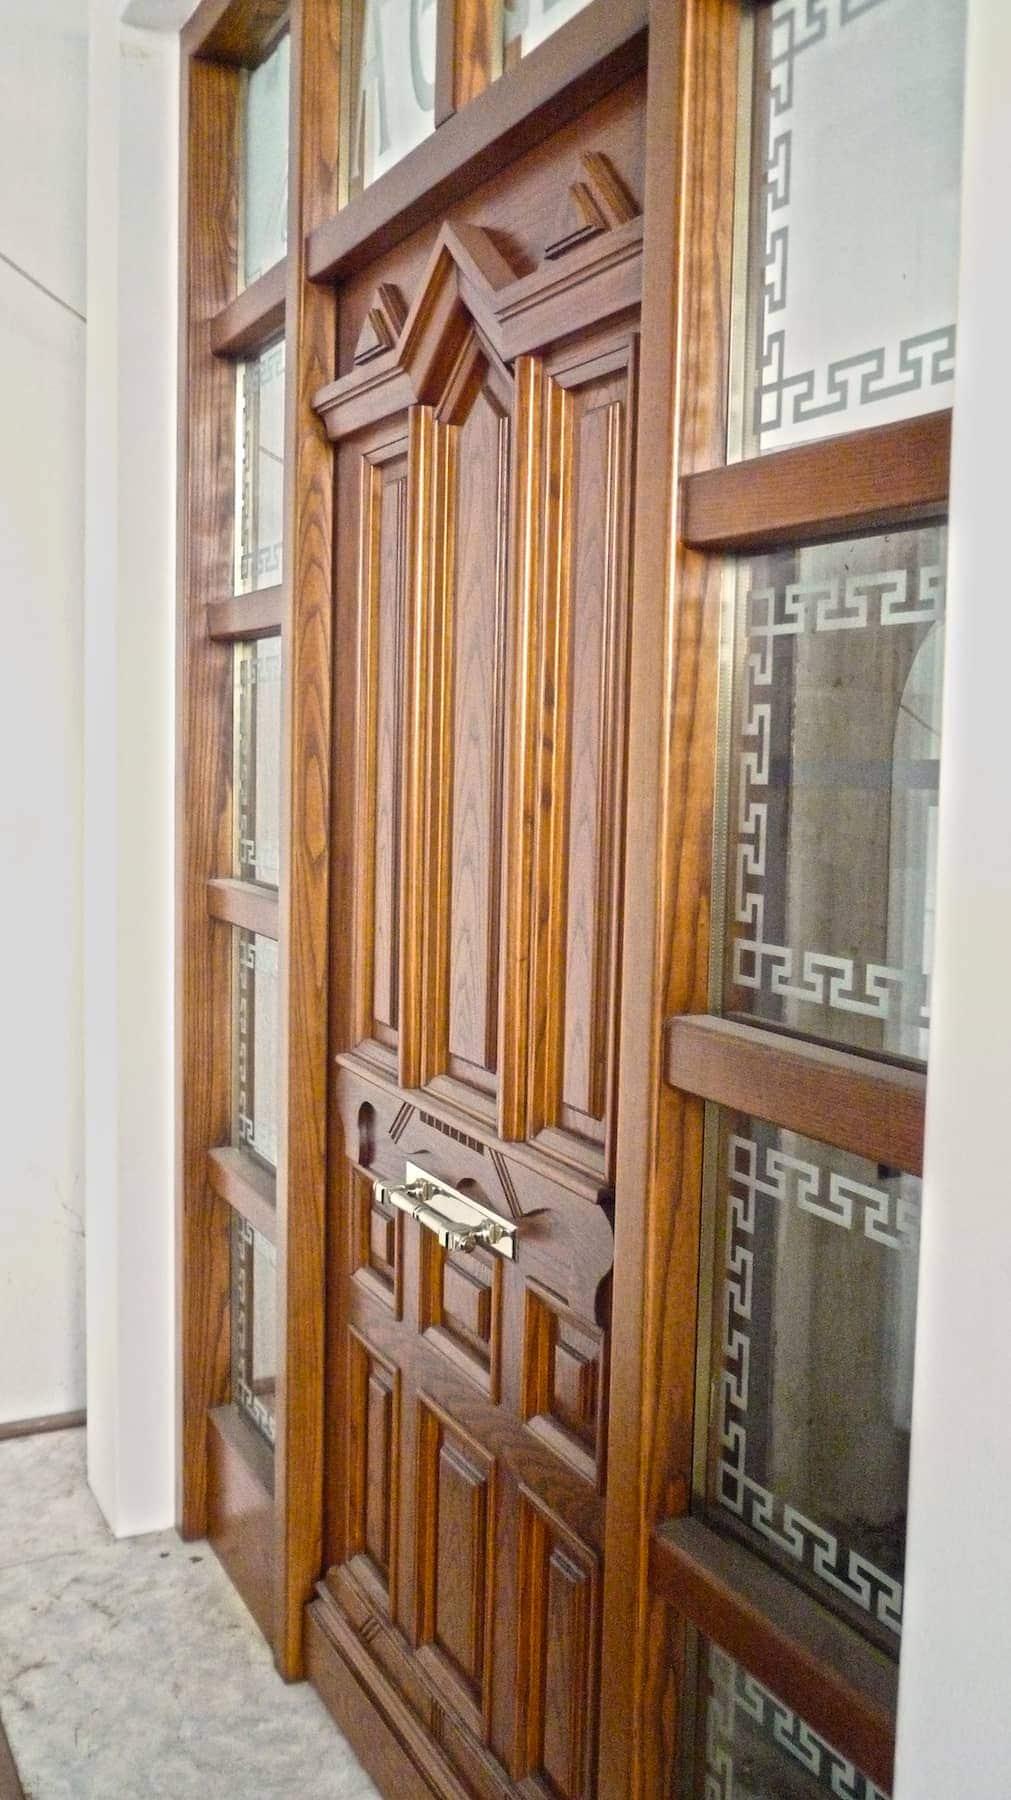 ATHOS Signature Collection Μονόφυλλη κύρια είσοδος με περιμετρικά τζαμιλίκια